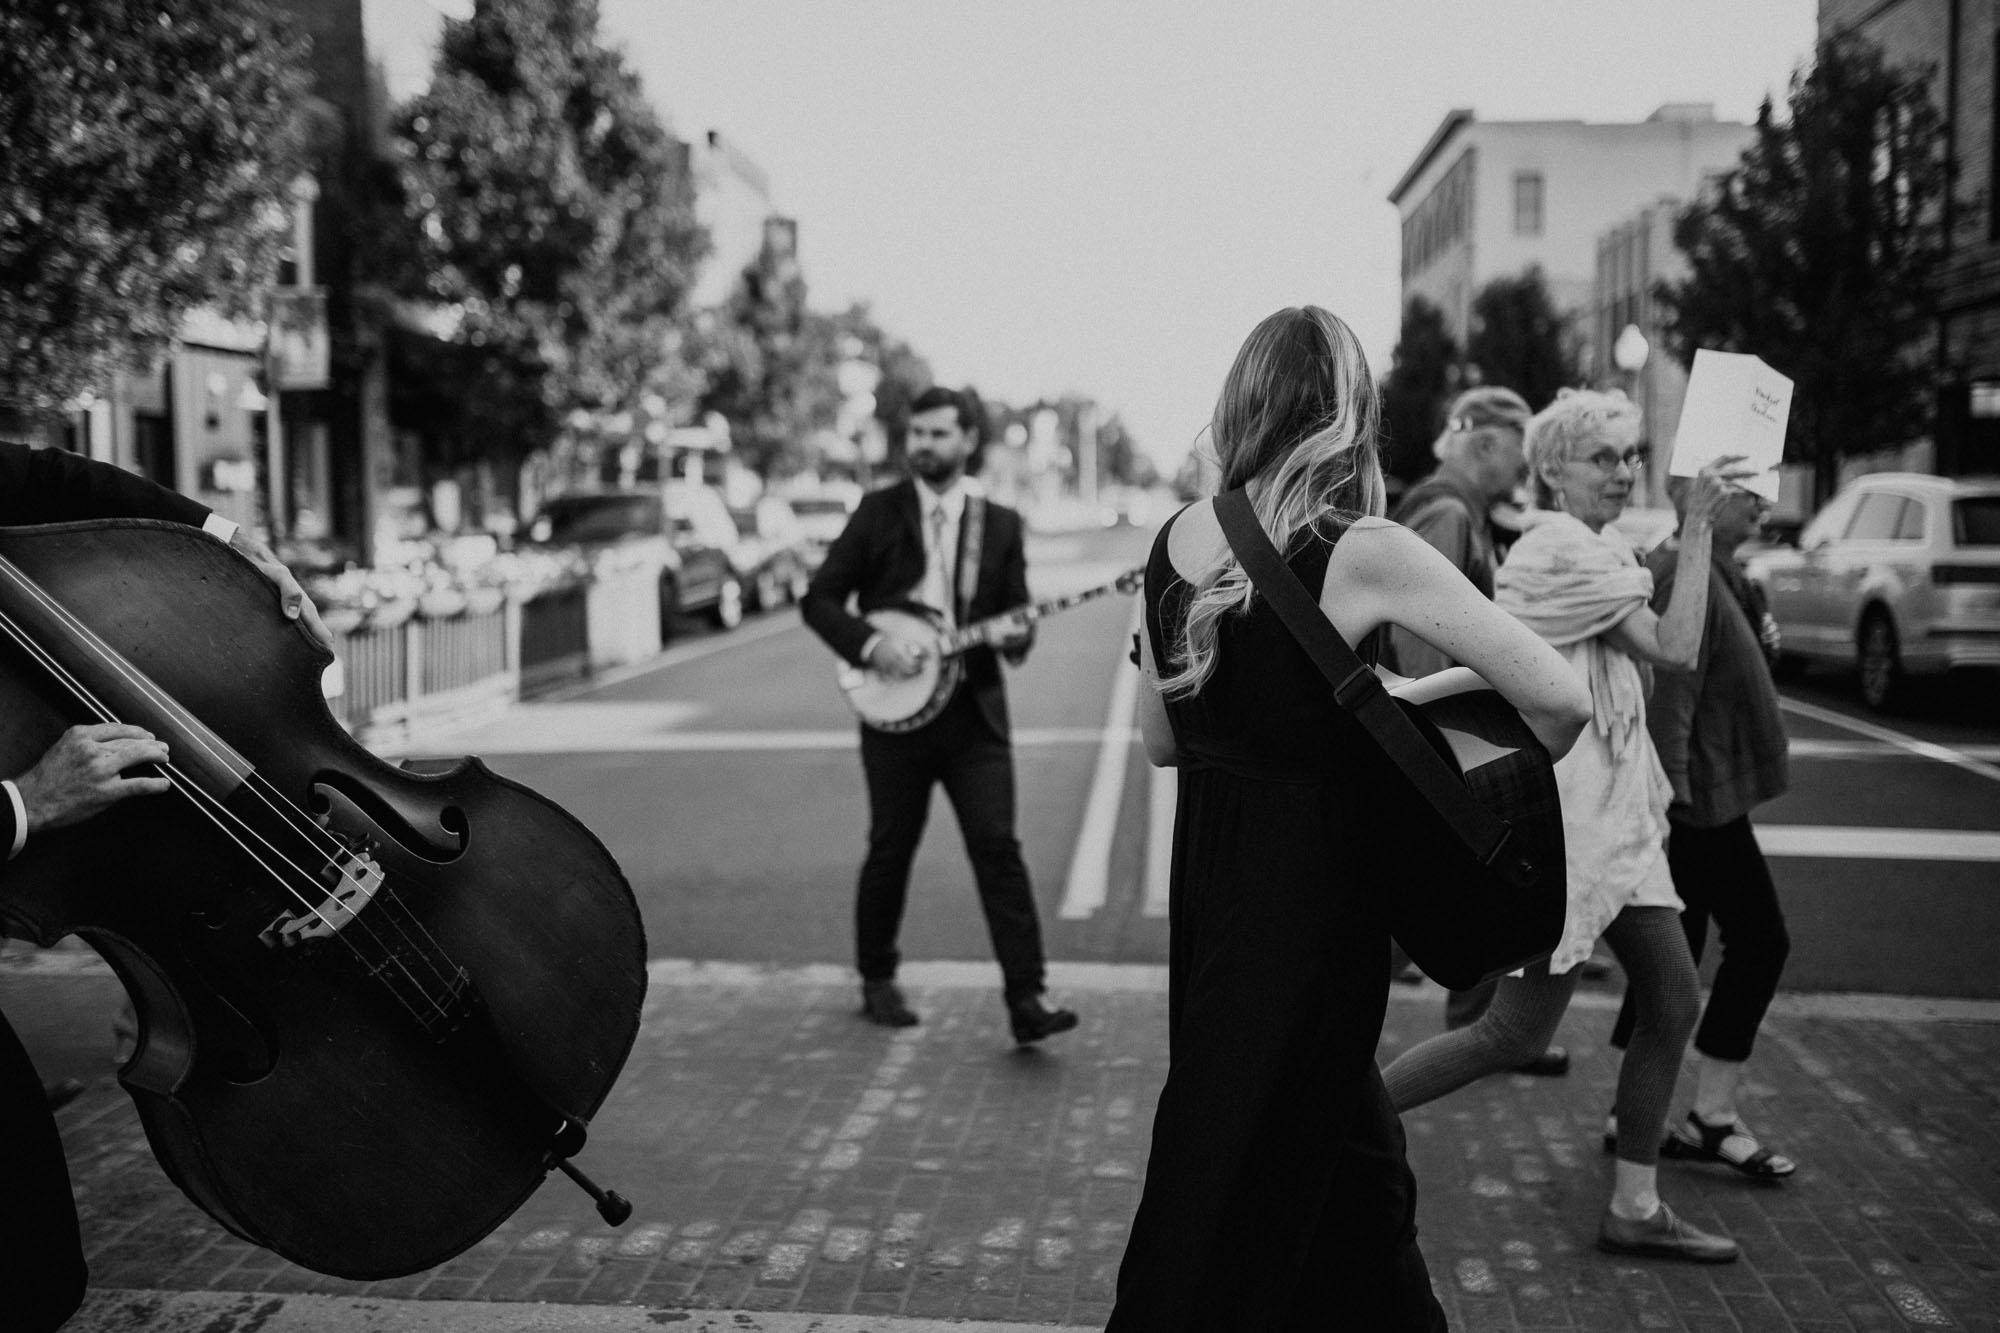 journeyman_distillery_wedding_photographer_chicago_il_wright_photographs-3975.jpg